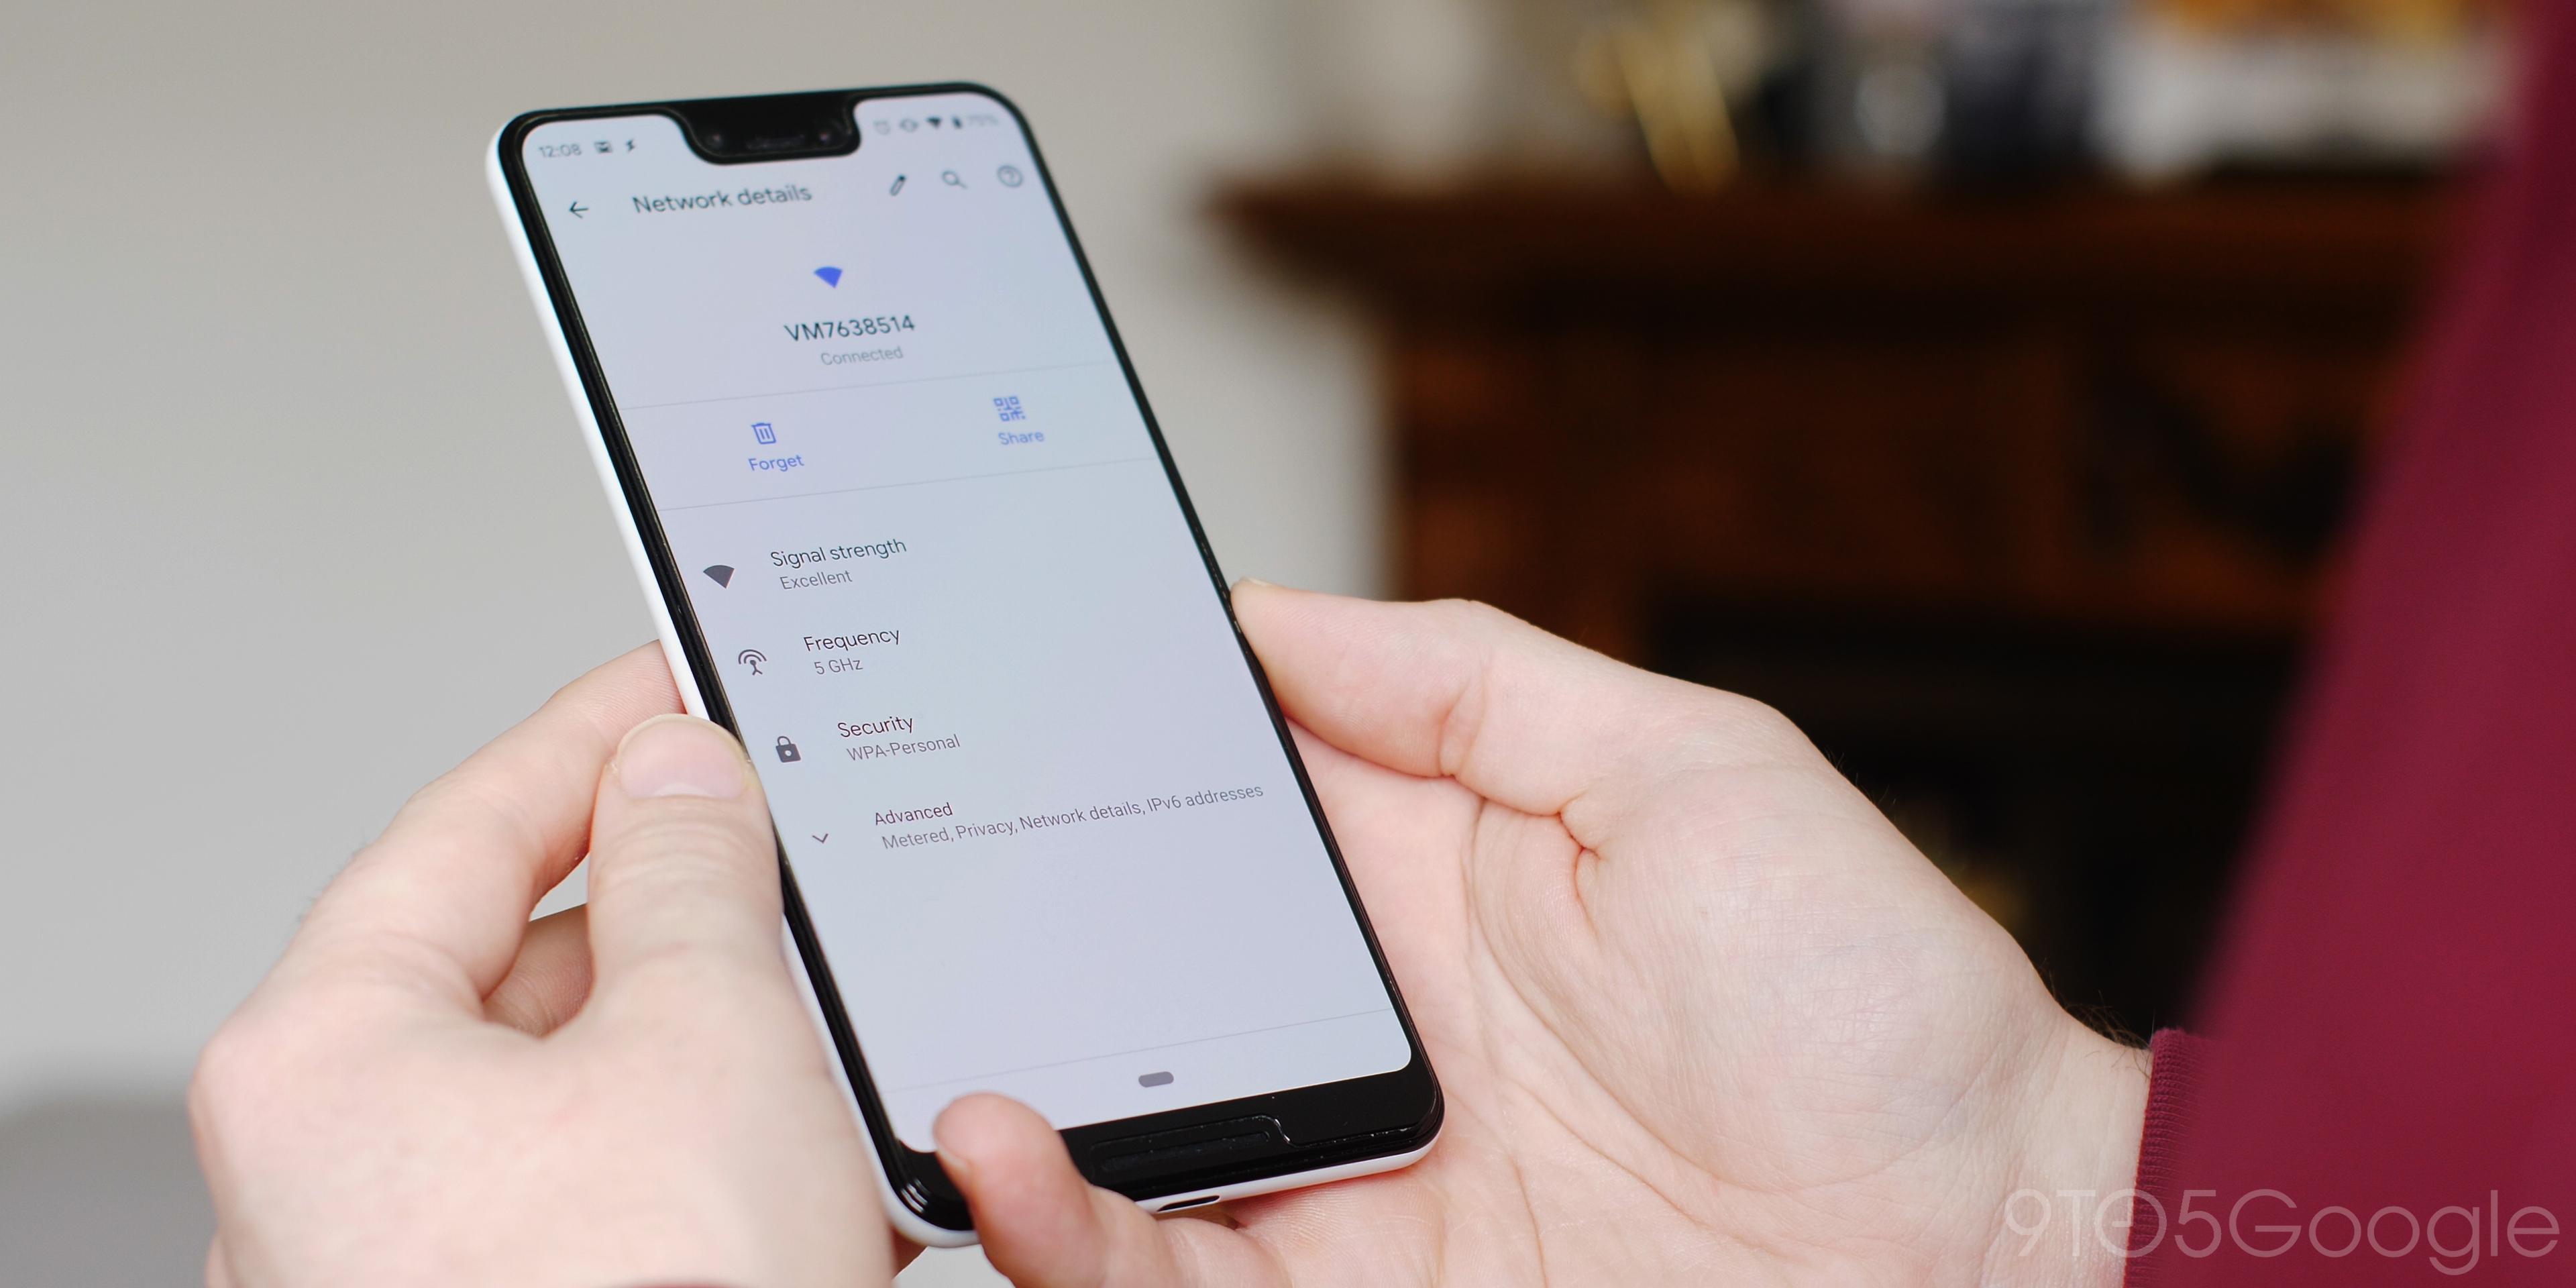 Wi-Fi QR Code sharing Android Q Beta 1